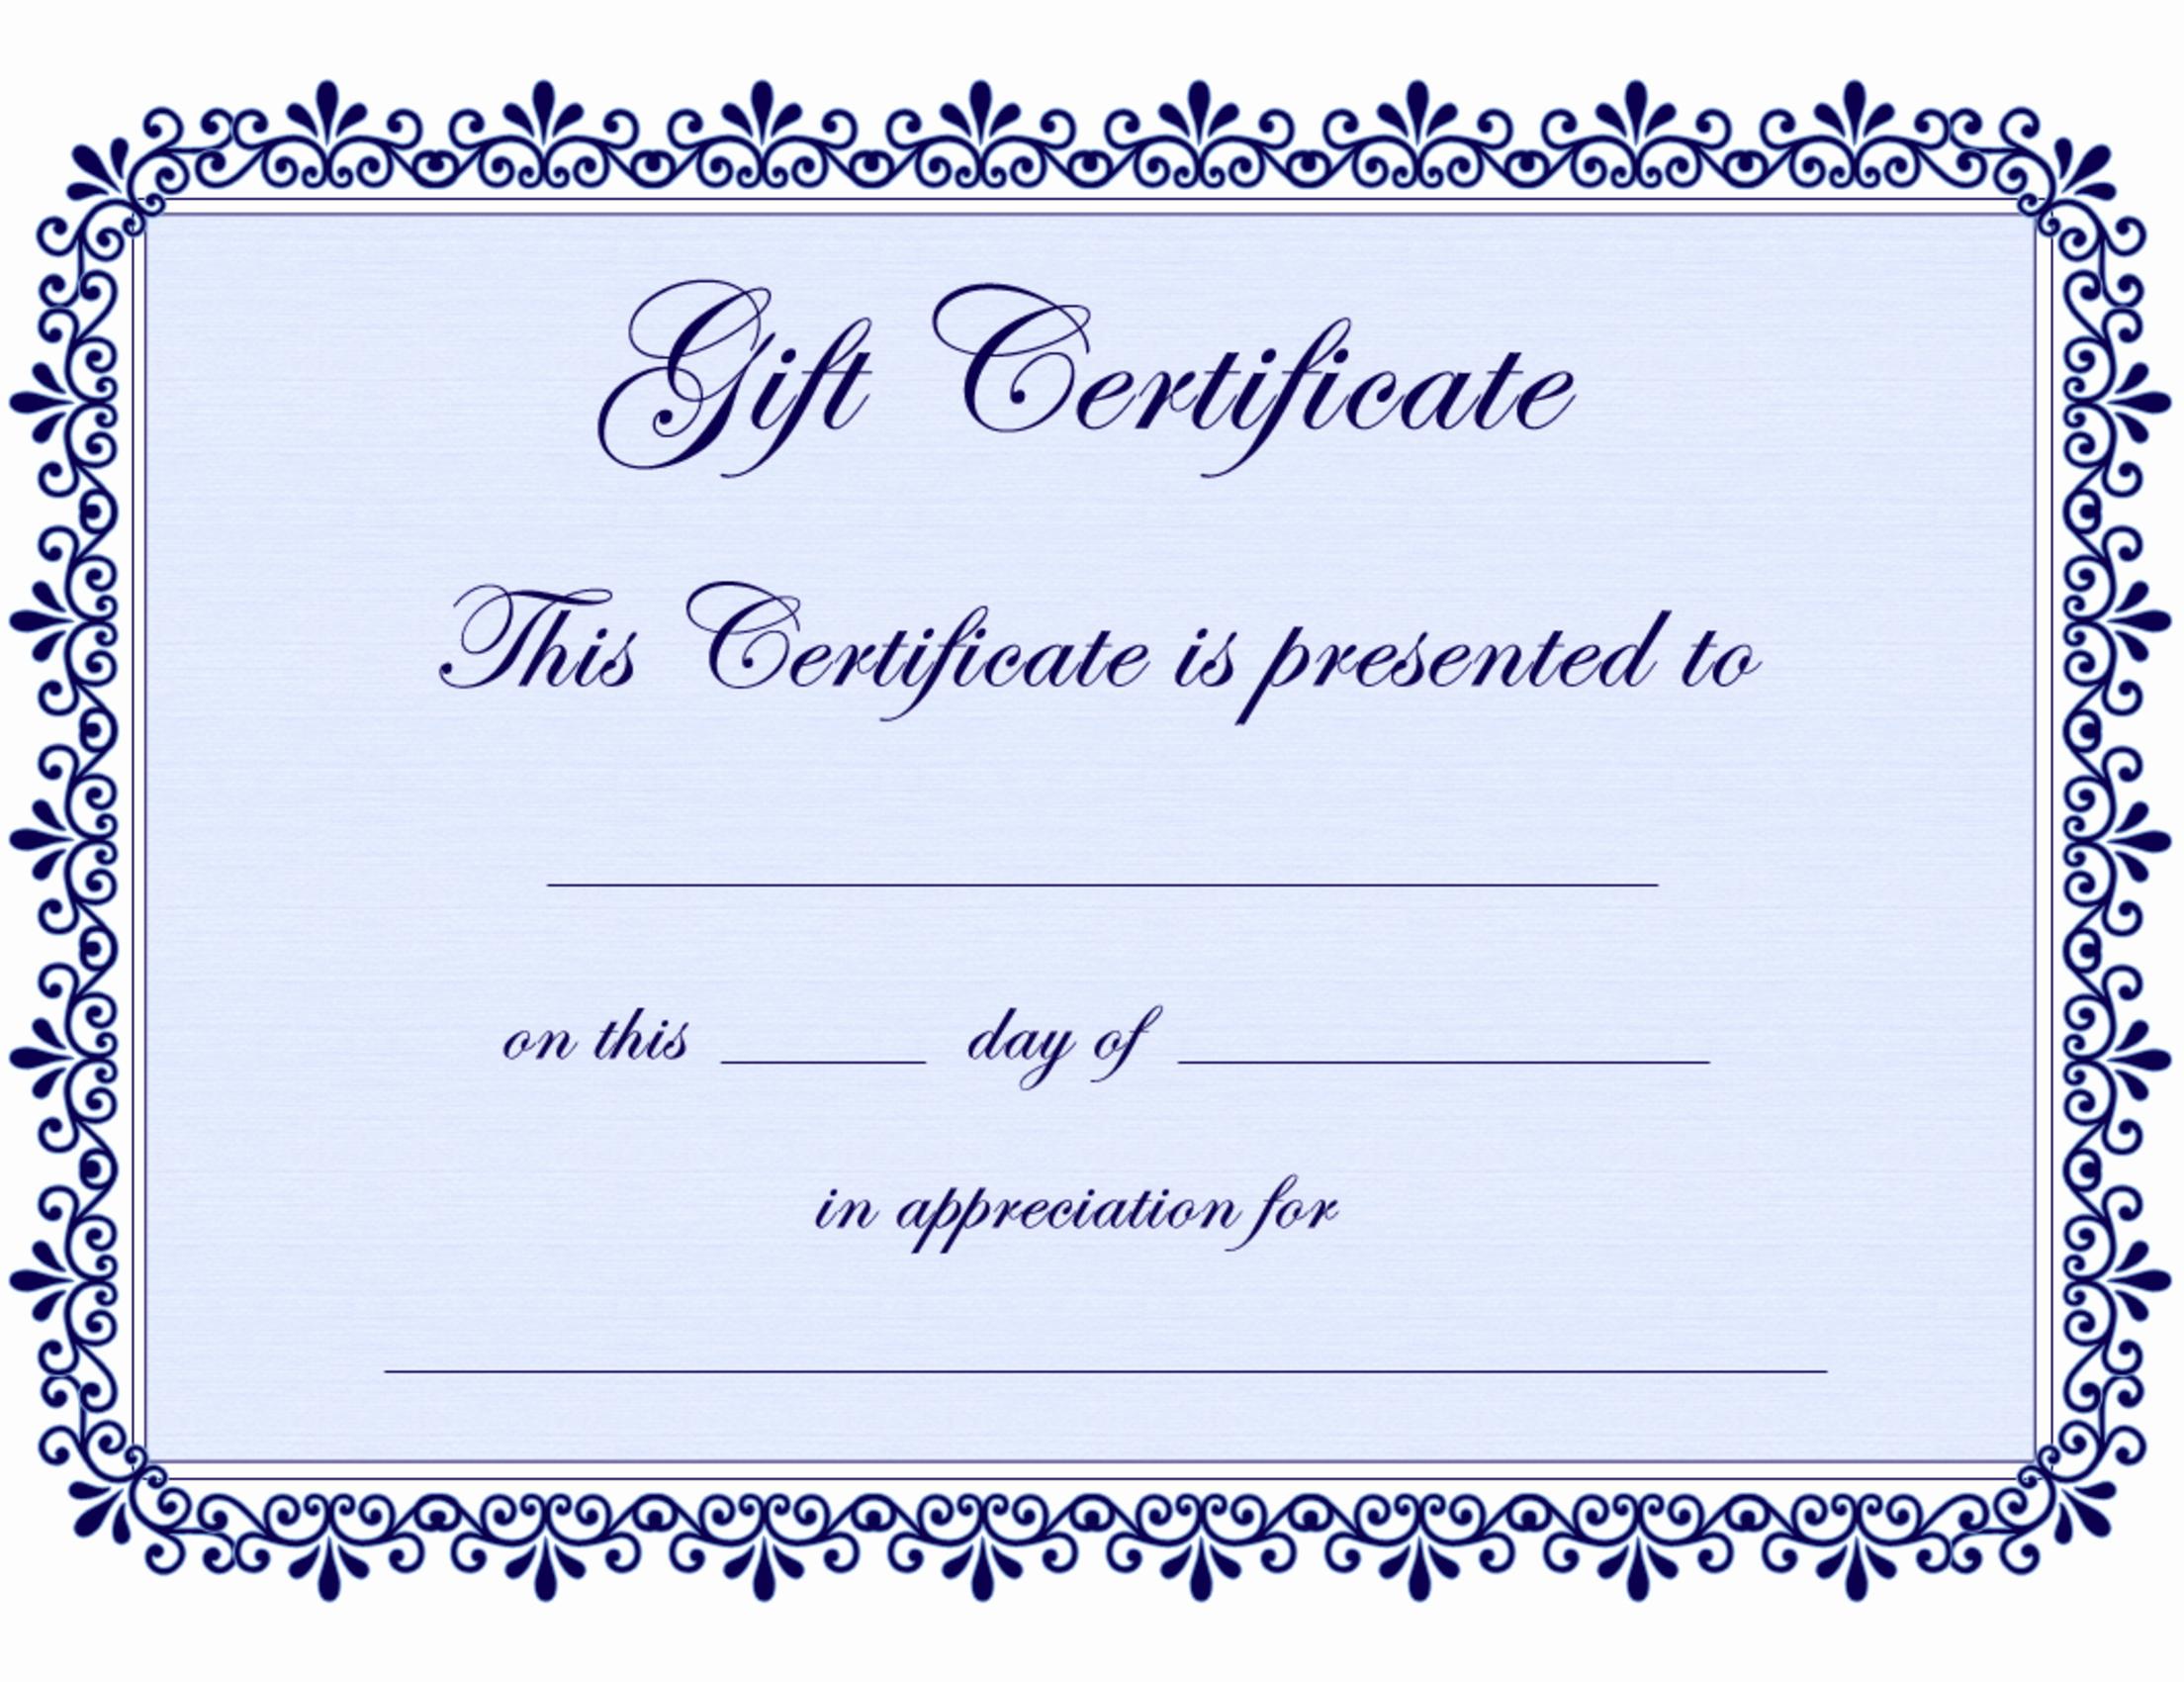 Pdf Certificate Template Free Luxury Certificate Templates